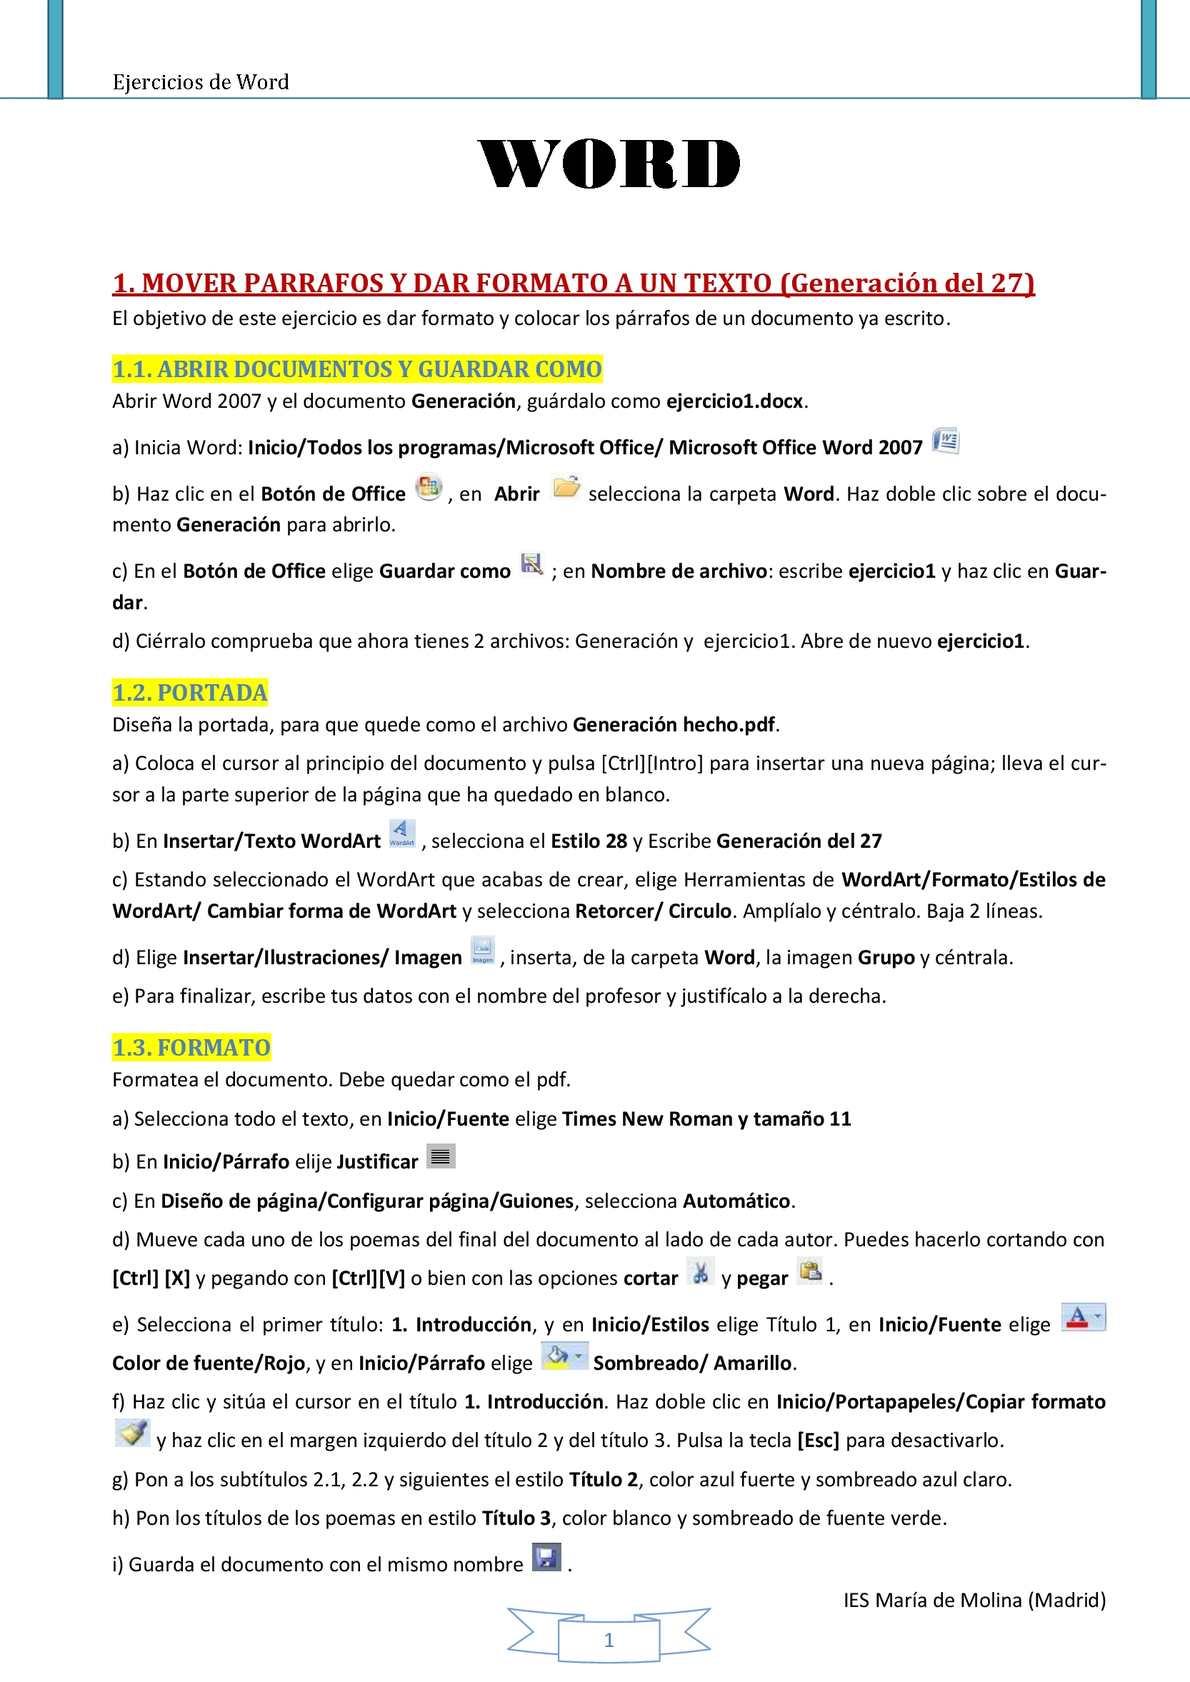 word 2007 pdf 保存